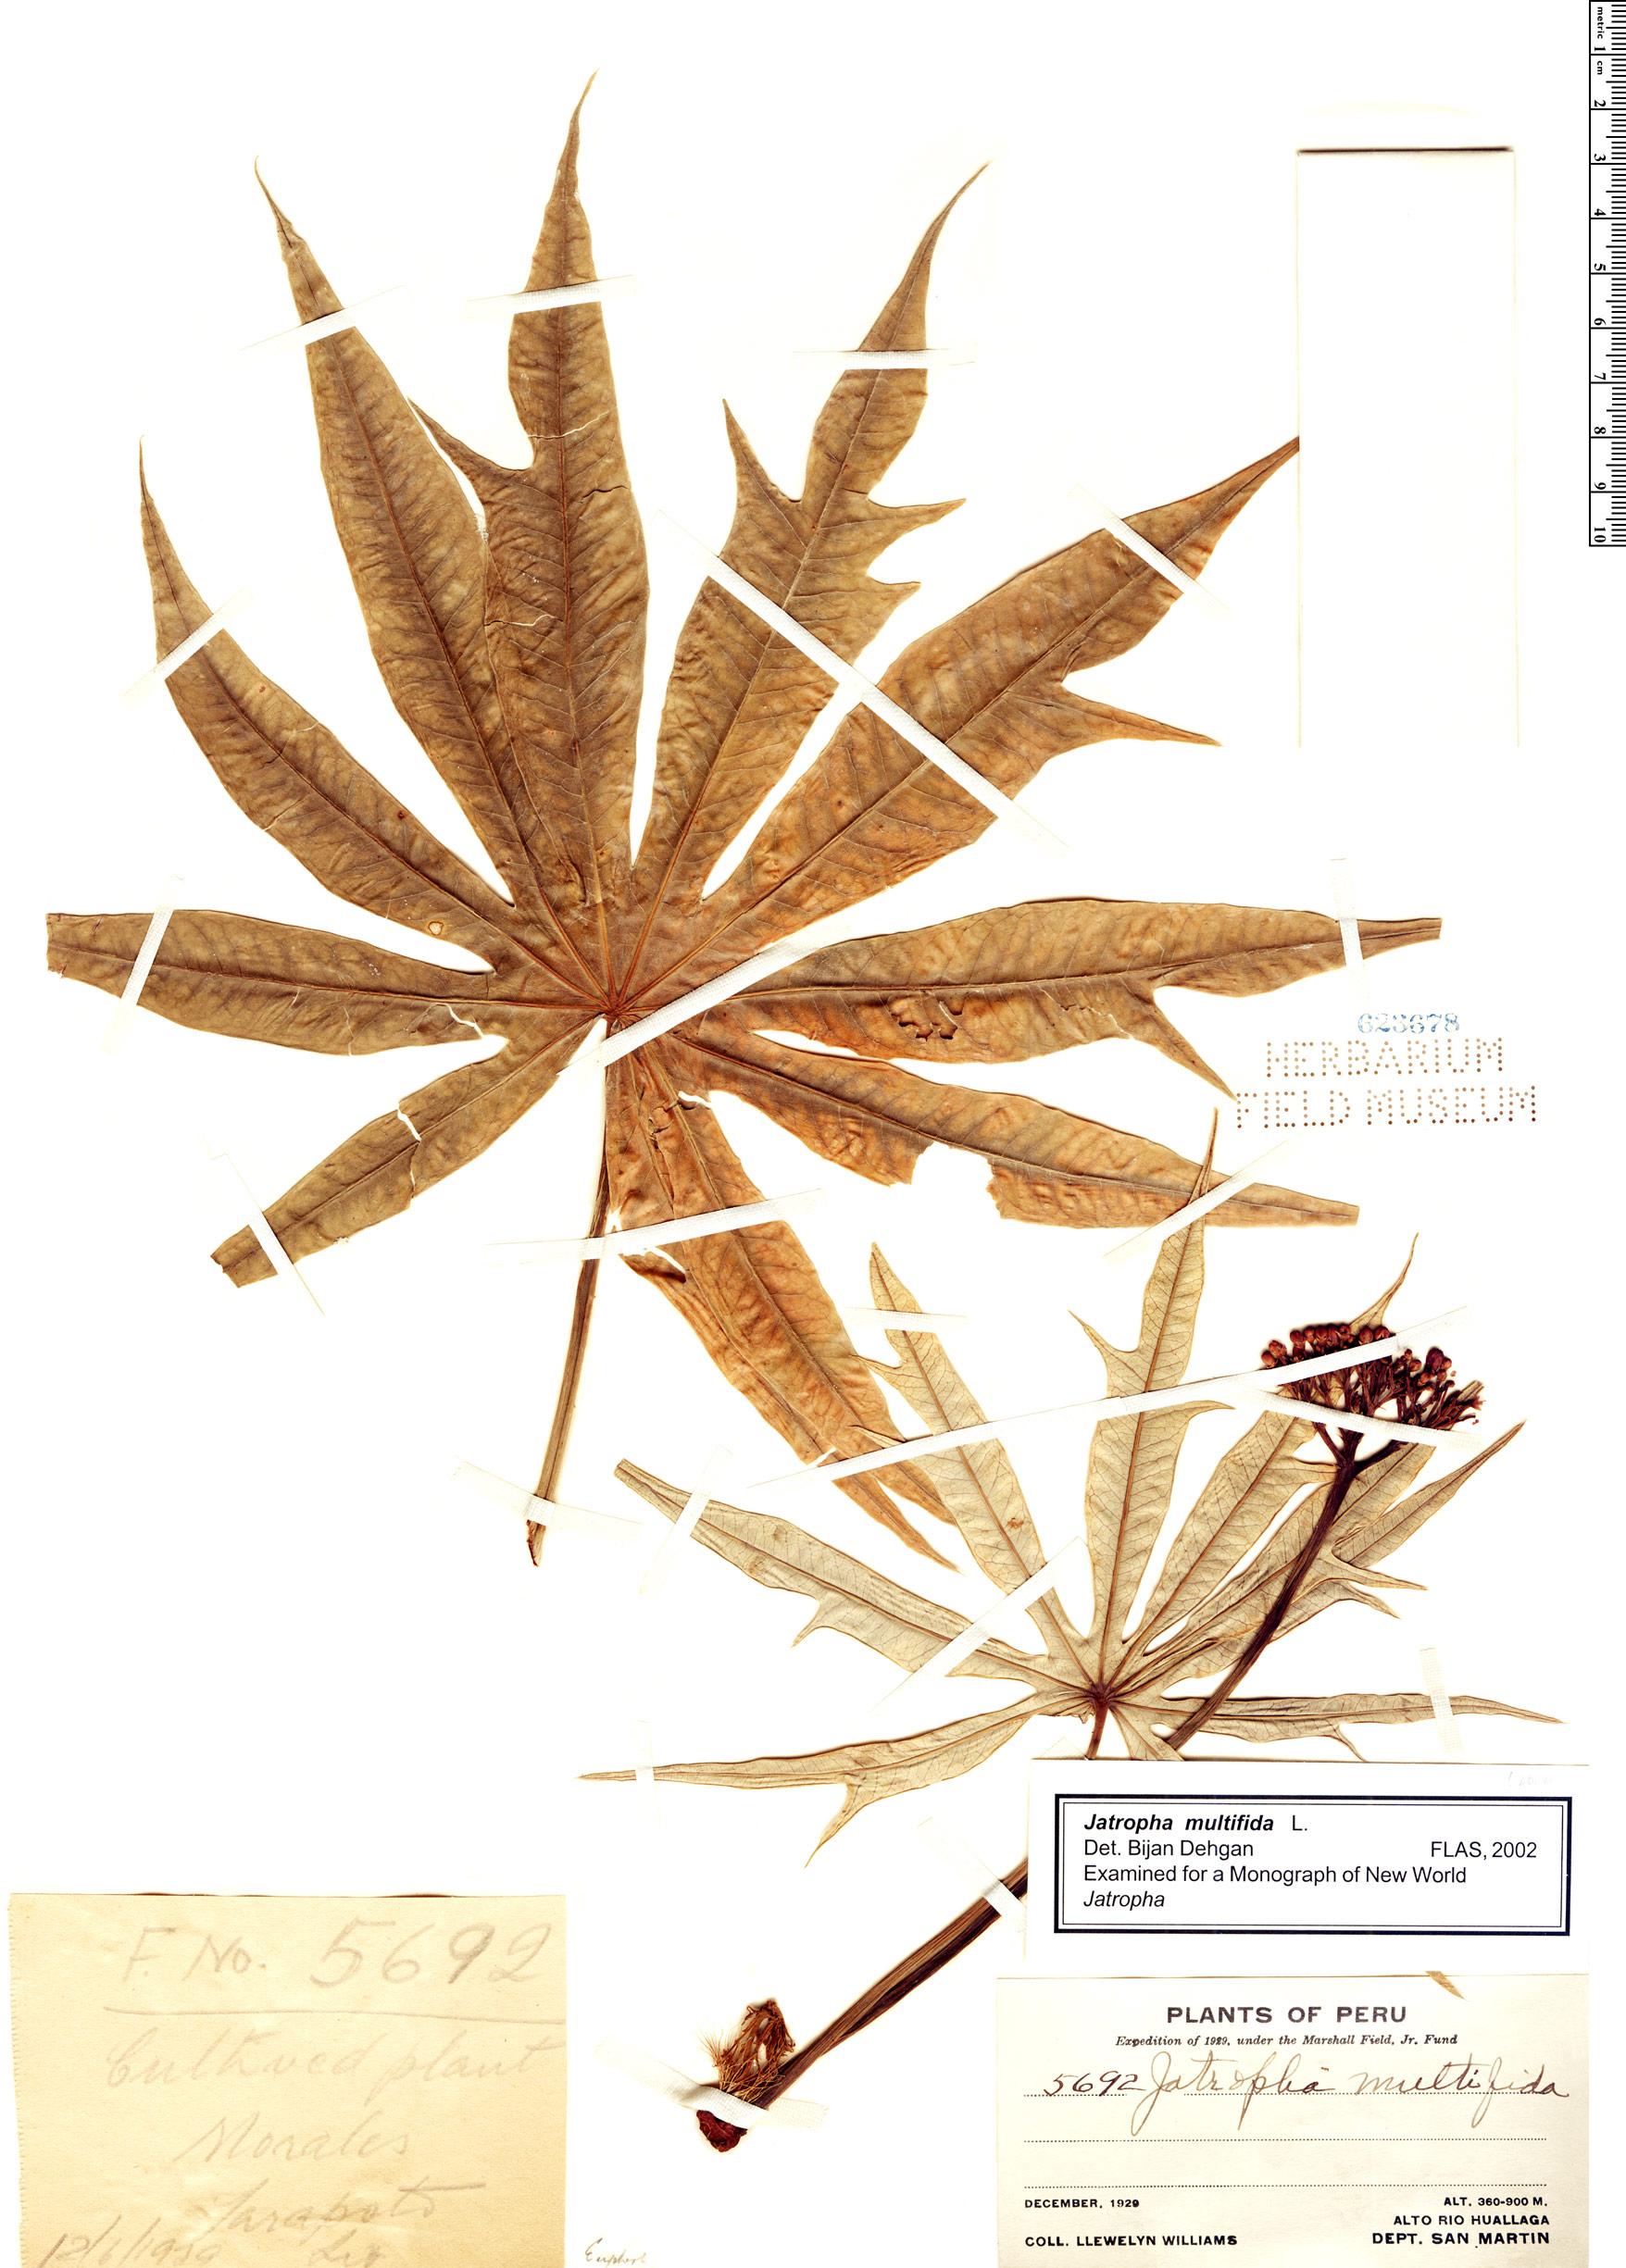 Specimen: Jatropha multifida